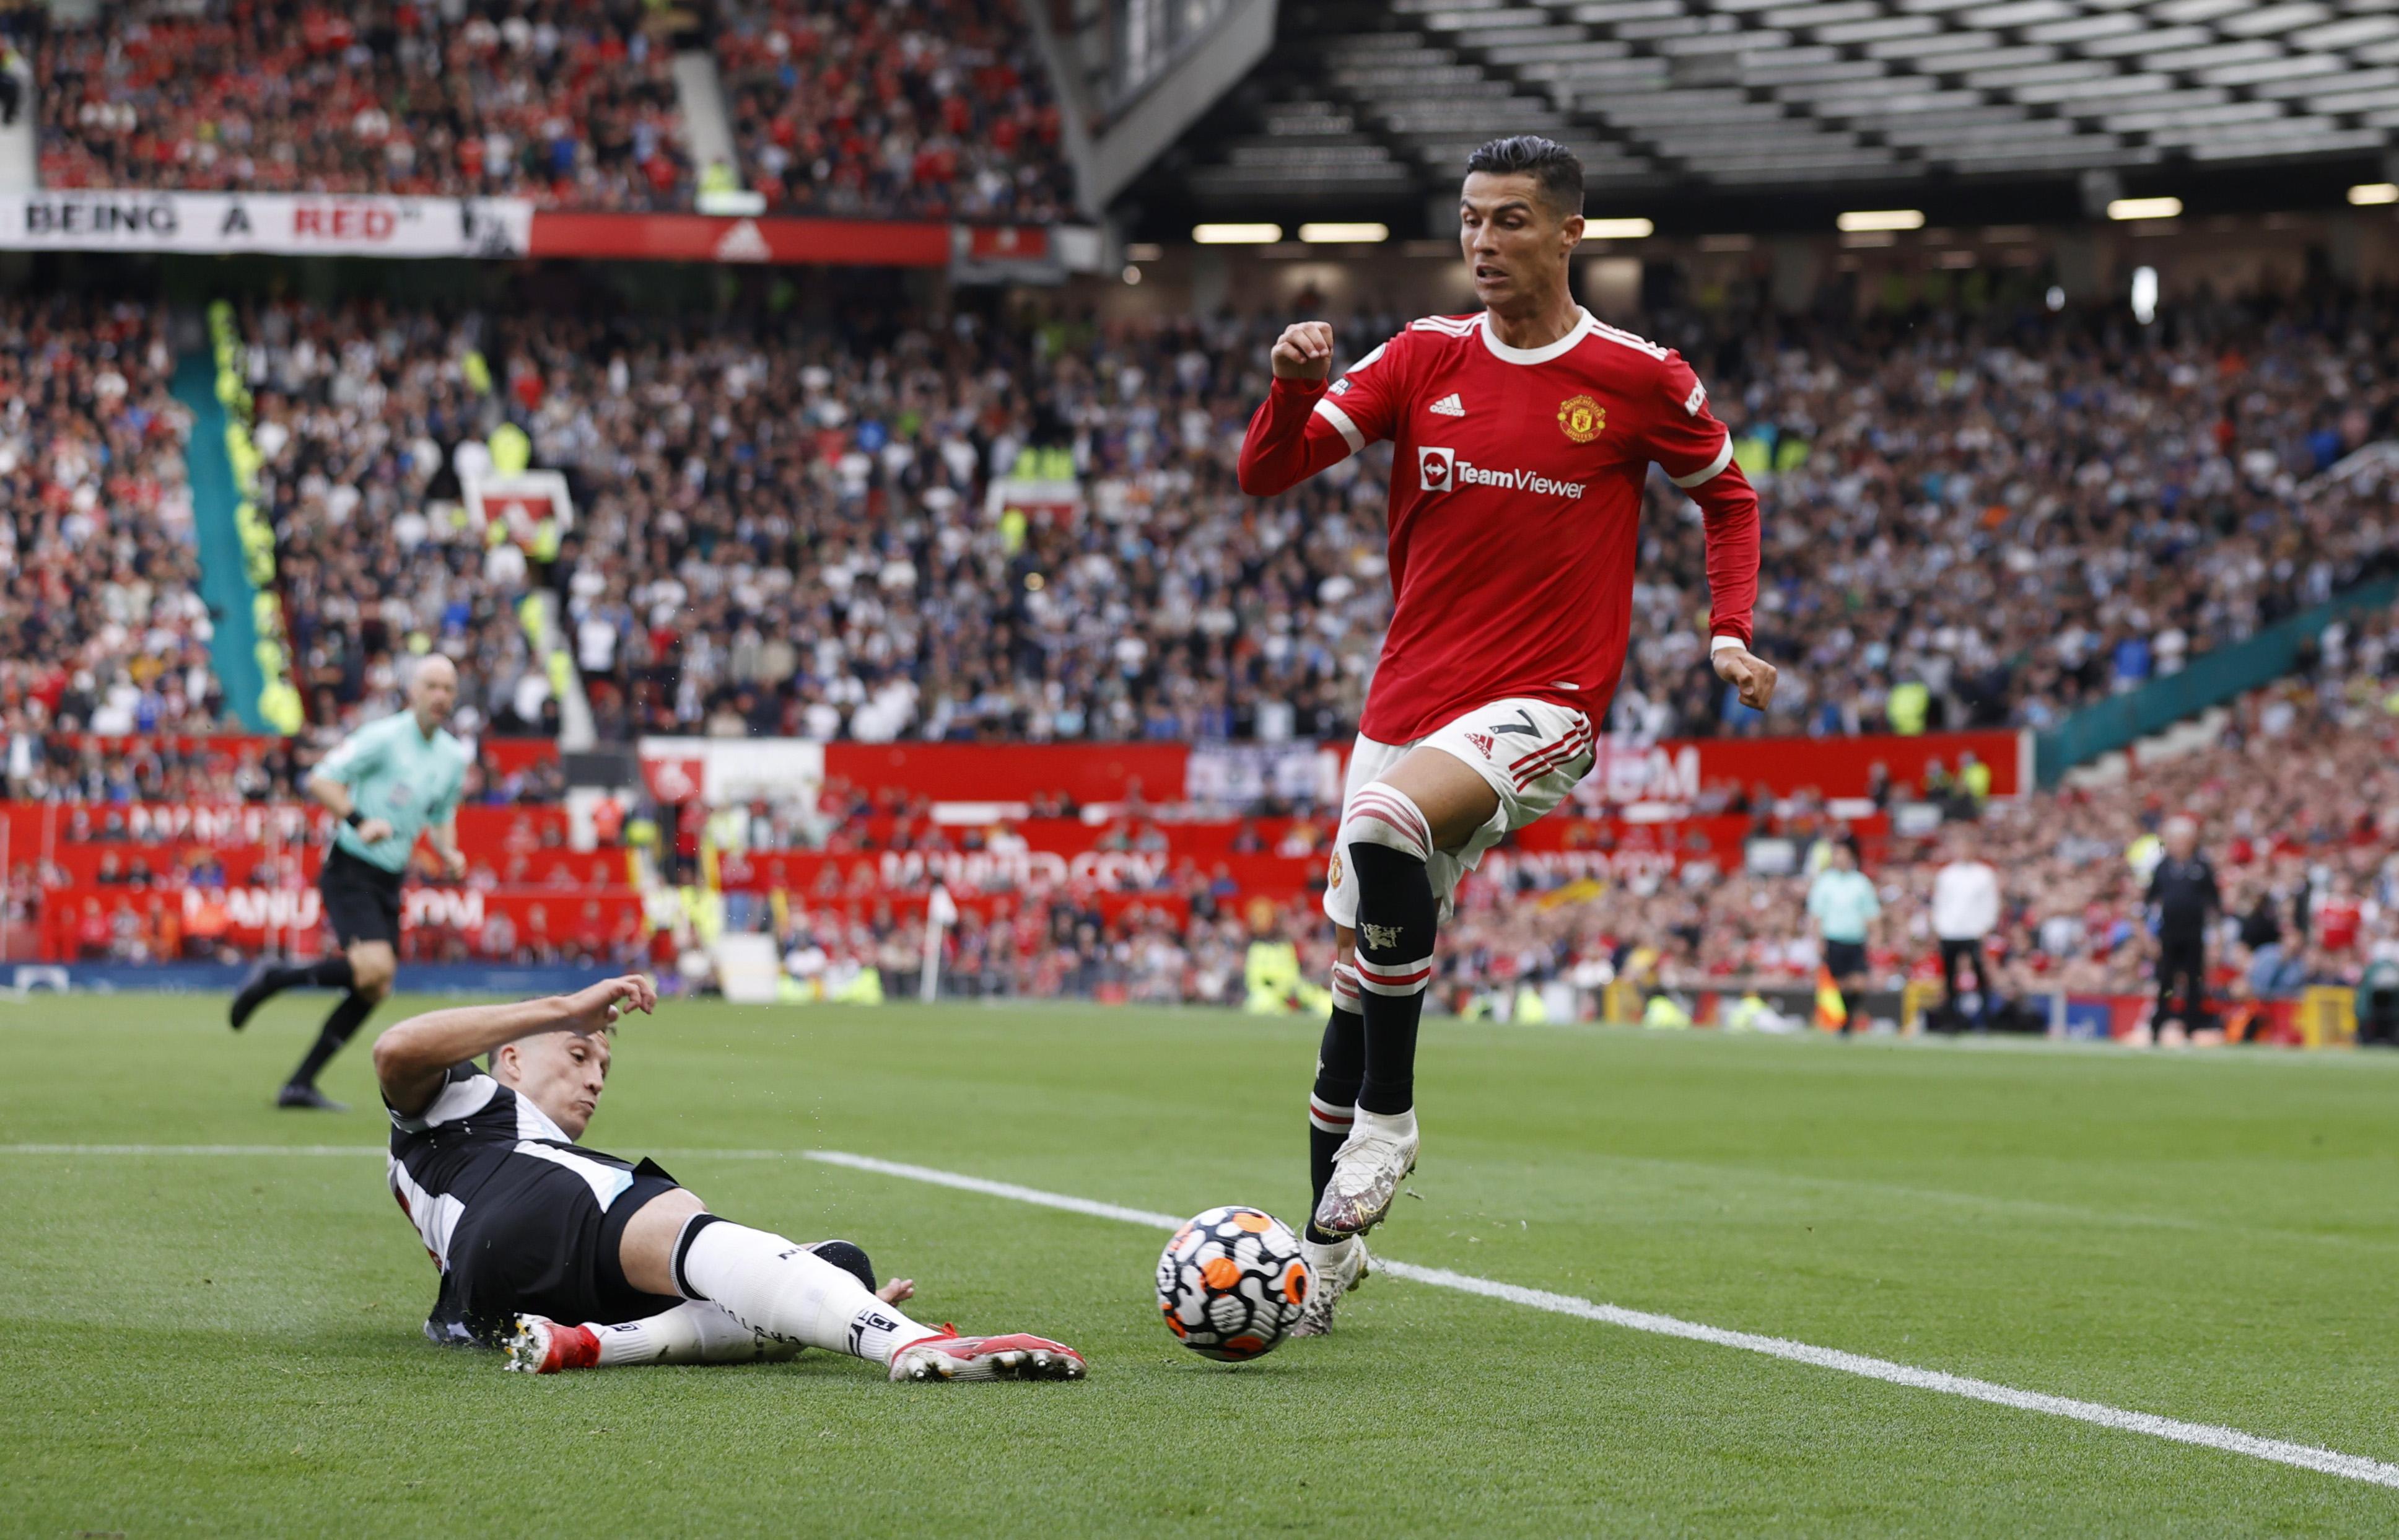 Premier League highlights: Matchday 4